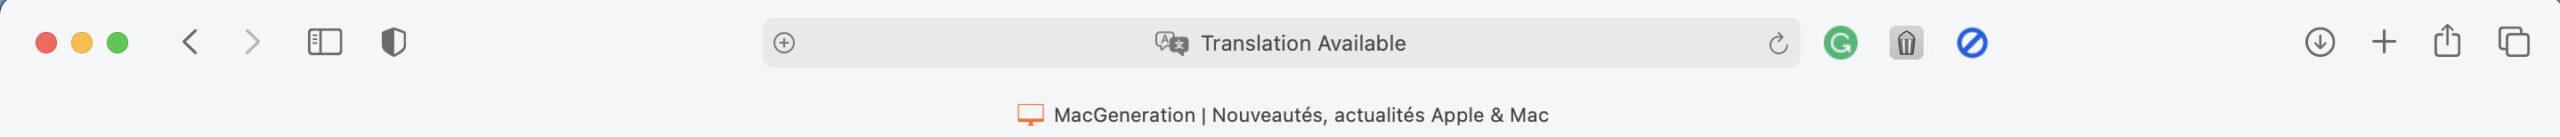 "Safari's ""Translation Available"" label"